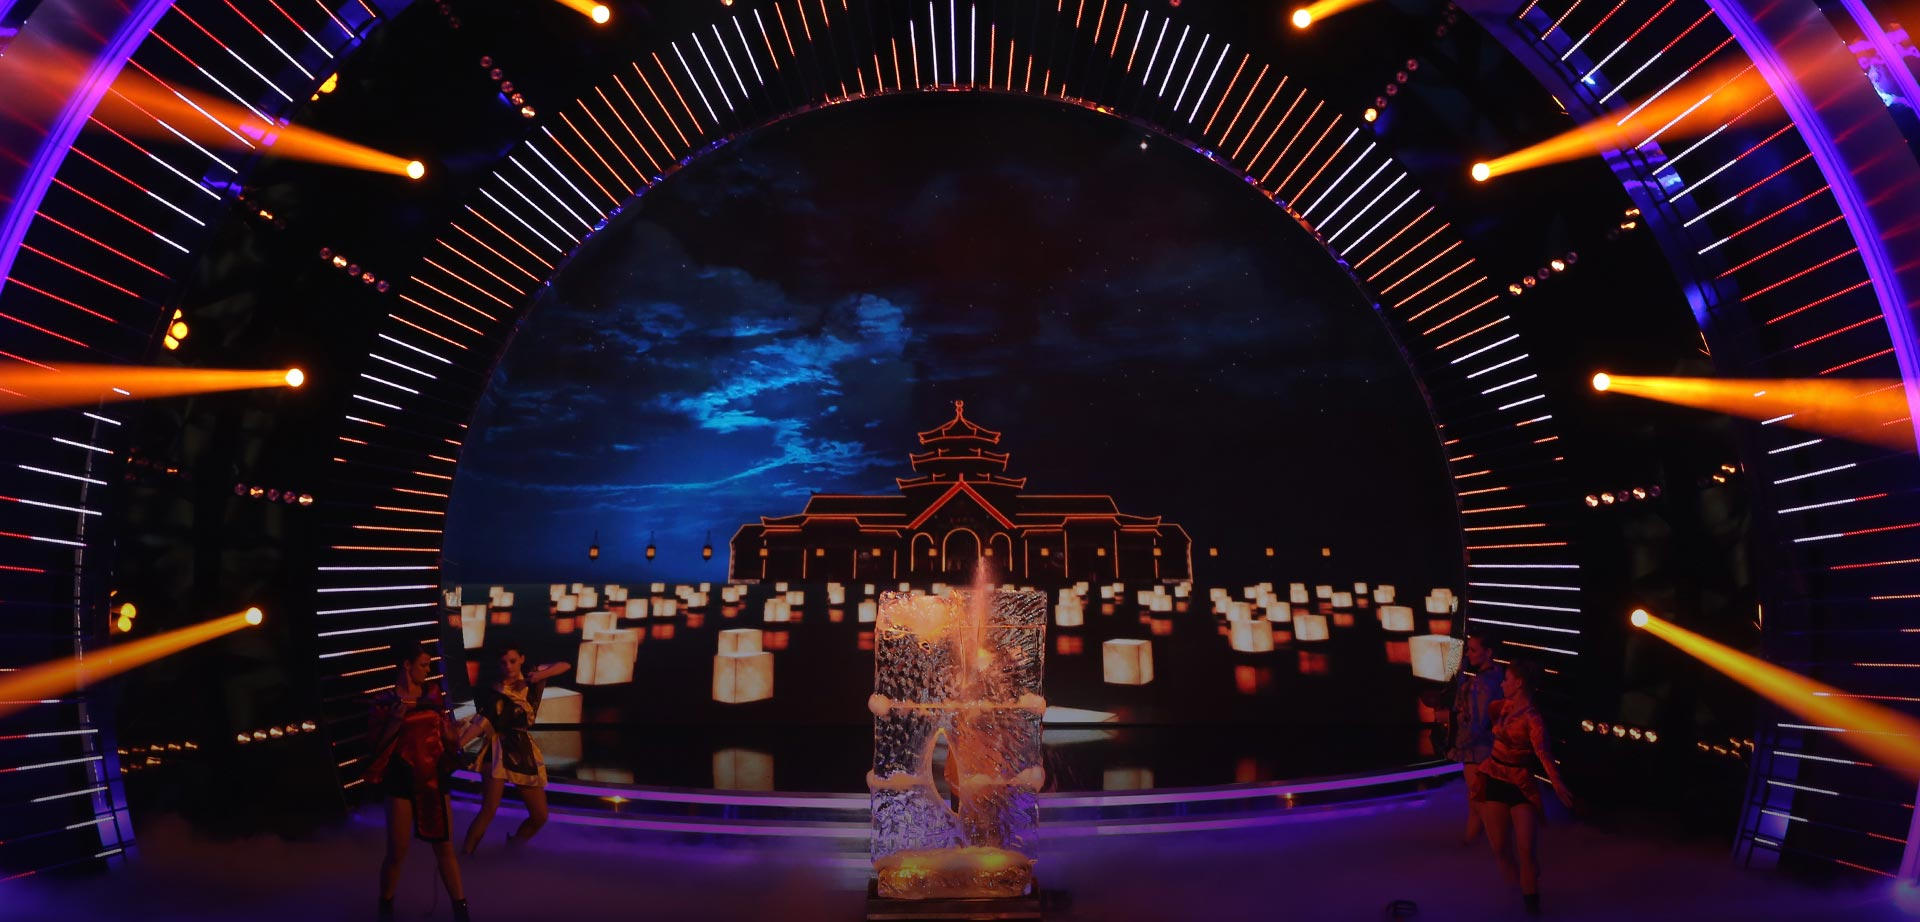 Hungary Got Talent TV show